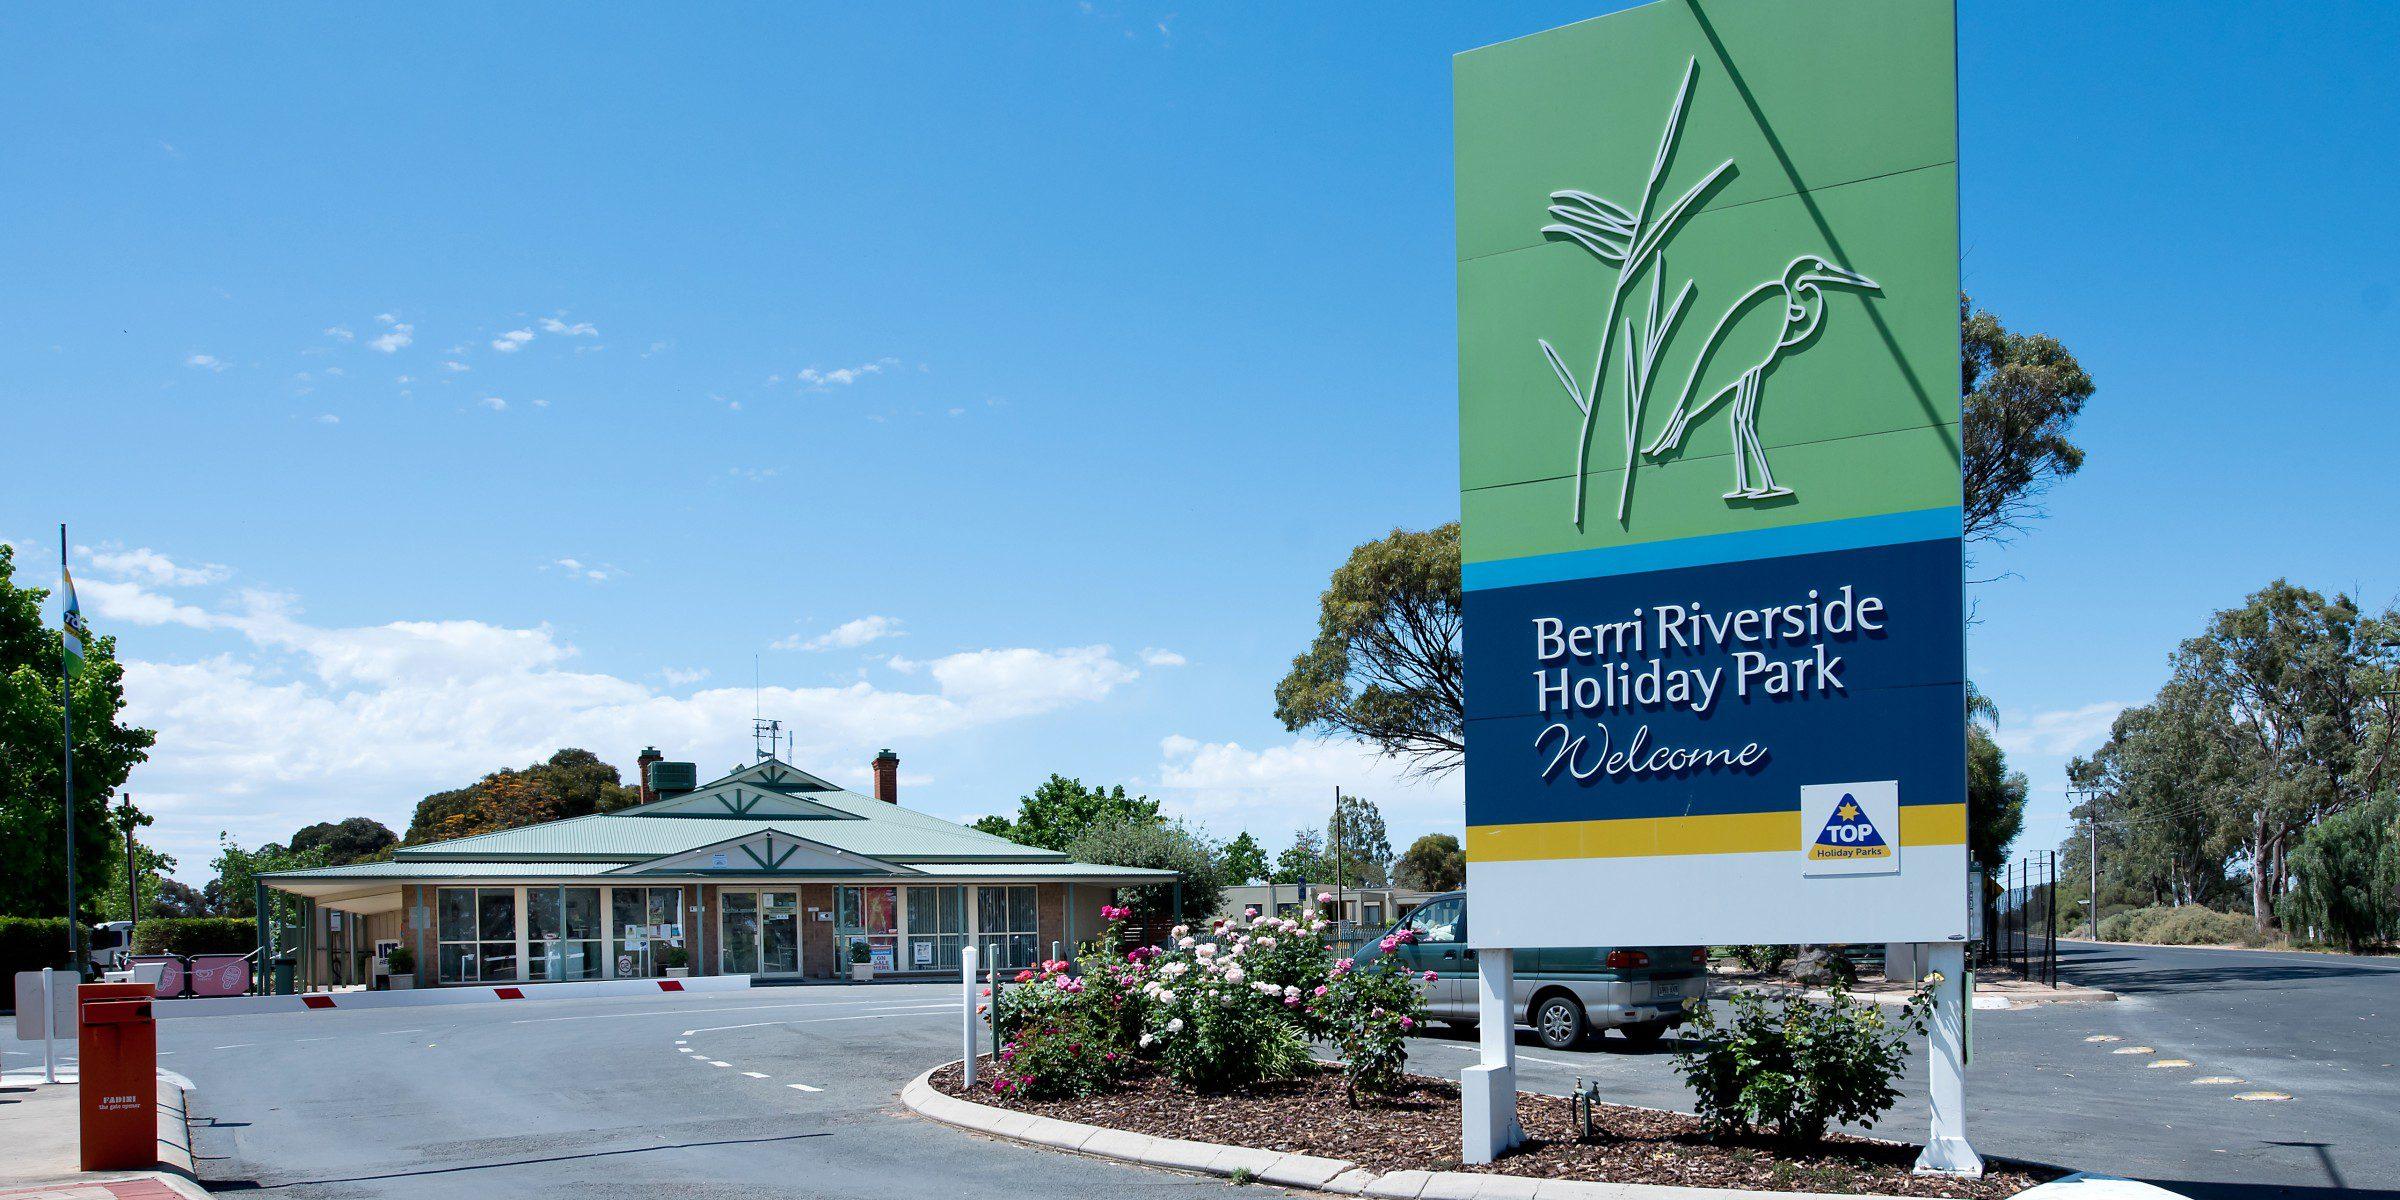 Berri Riverside Holiday Park main entry